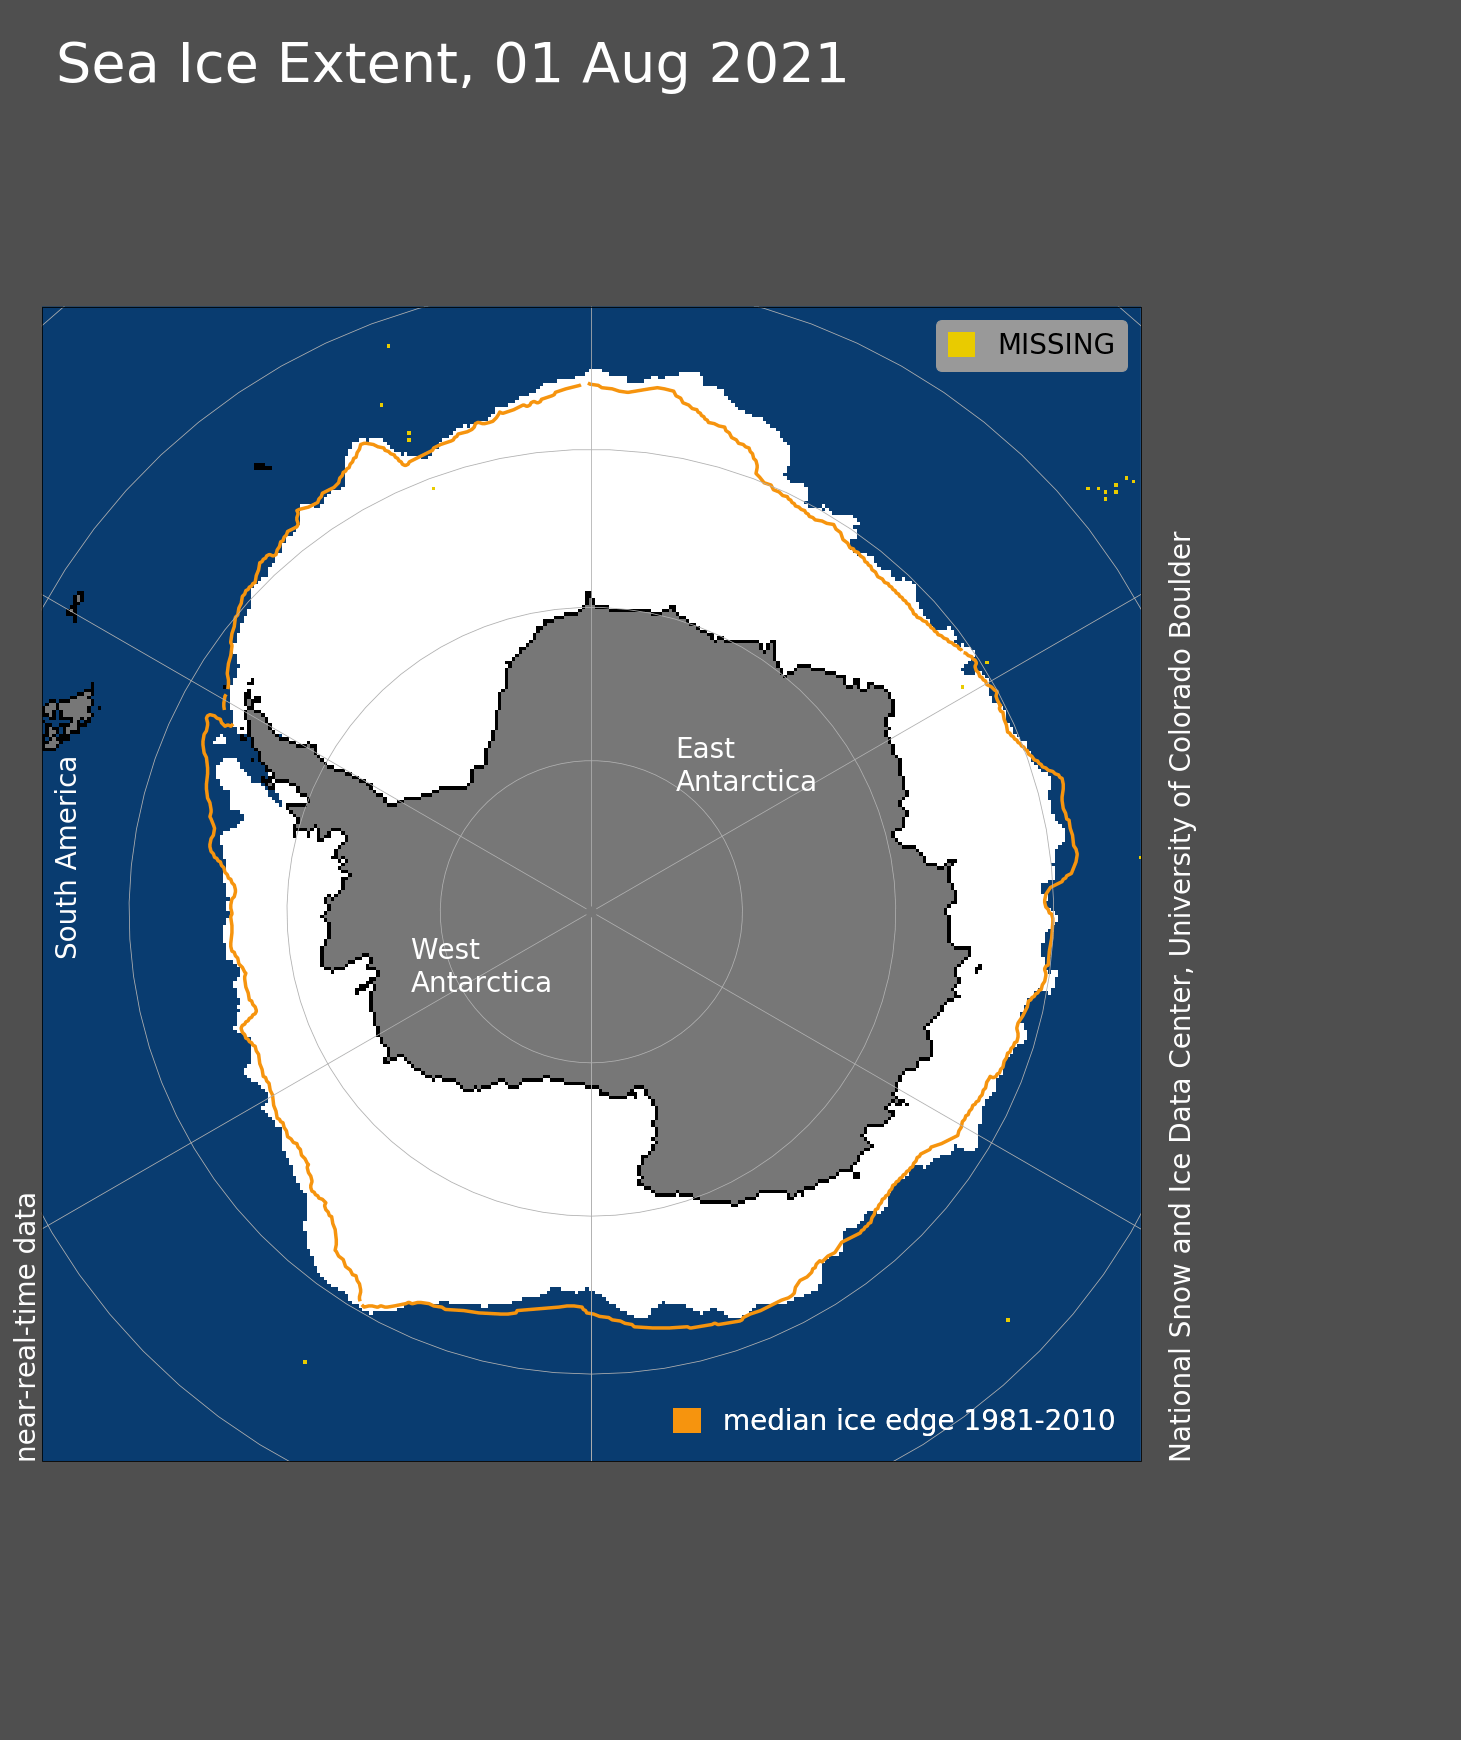 antarctic-sea-ice-extent-2021-summer-analysis-map